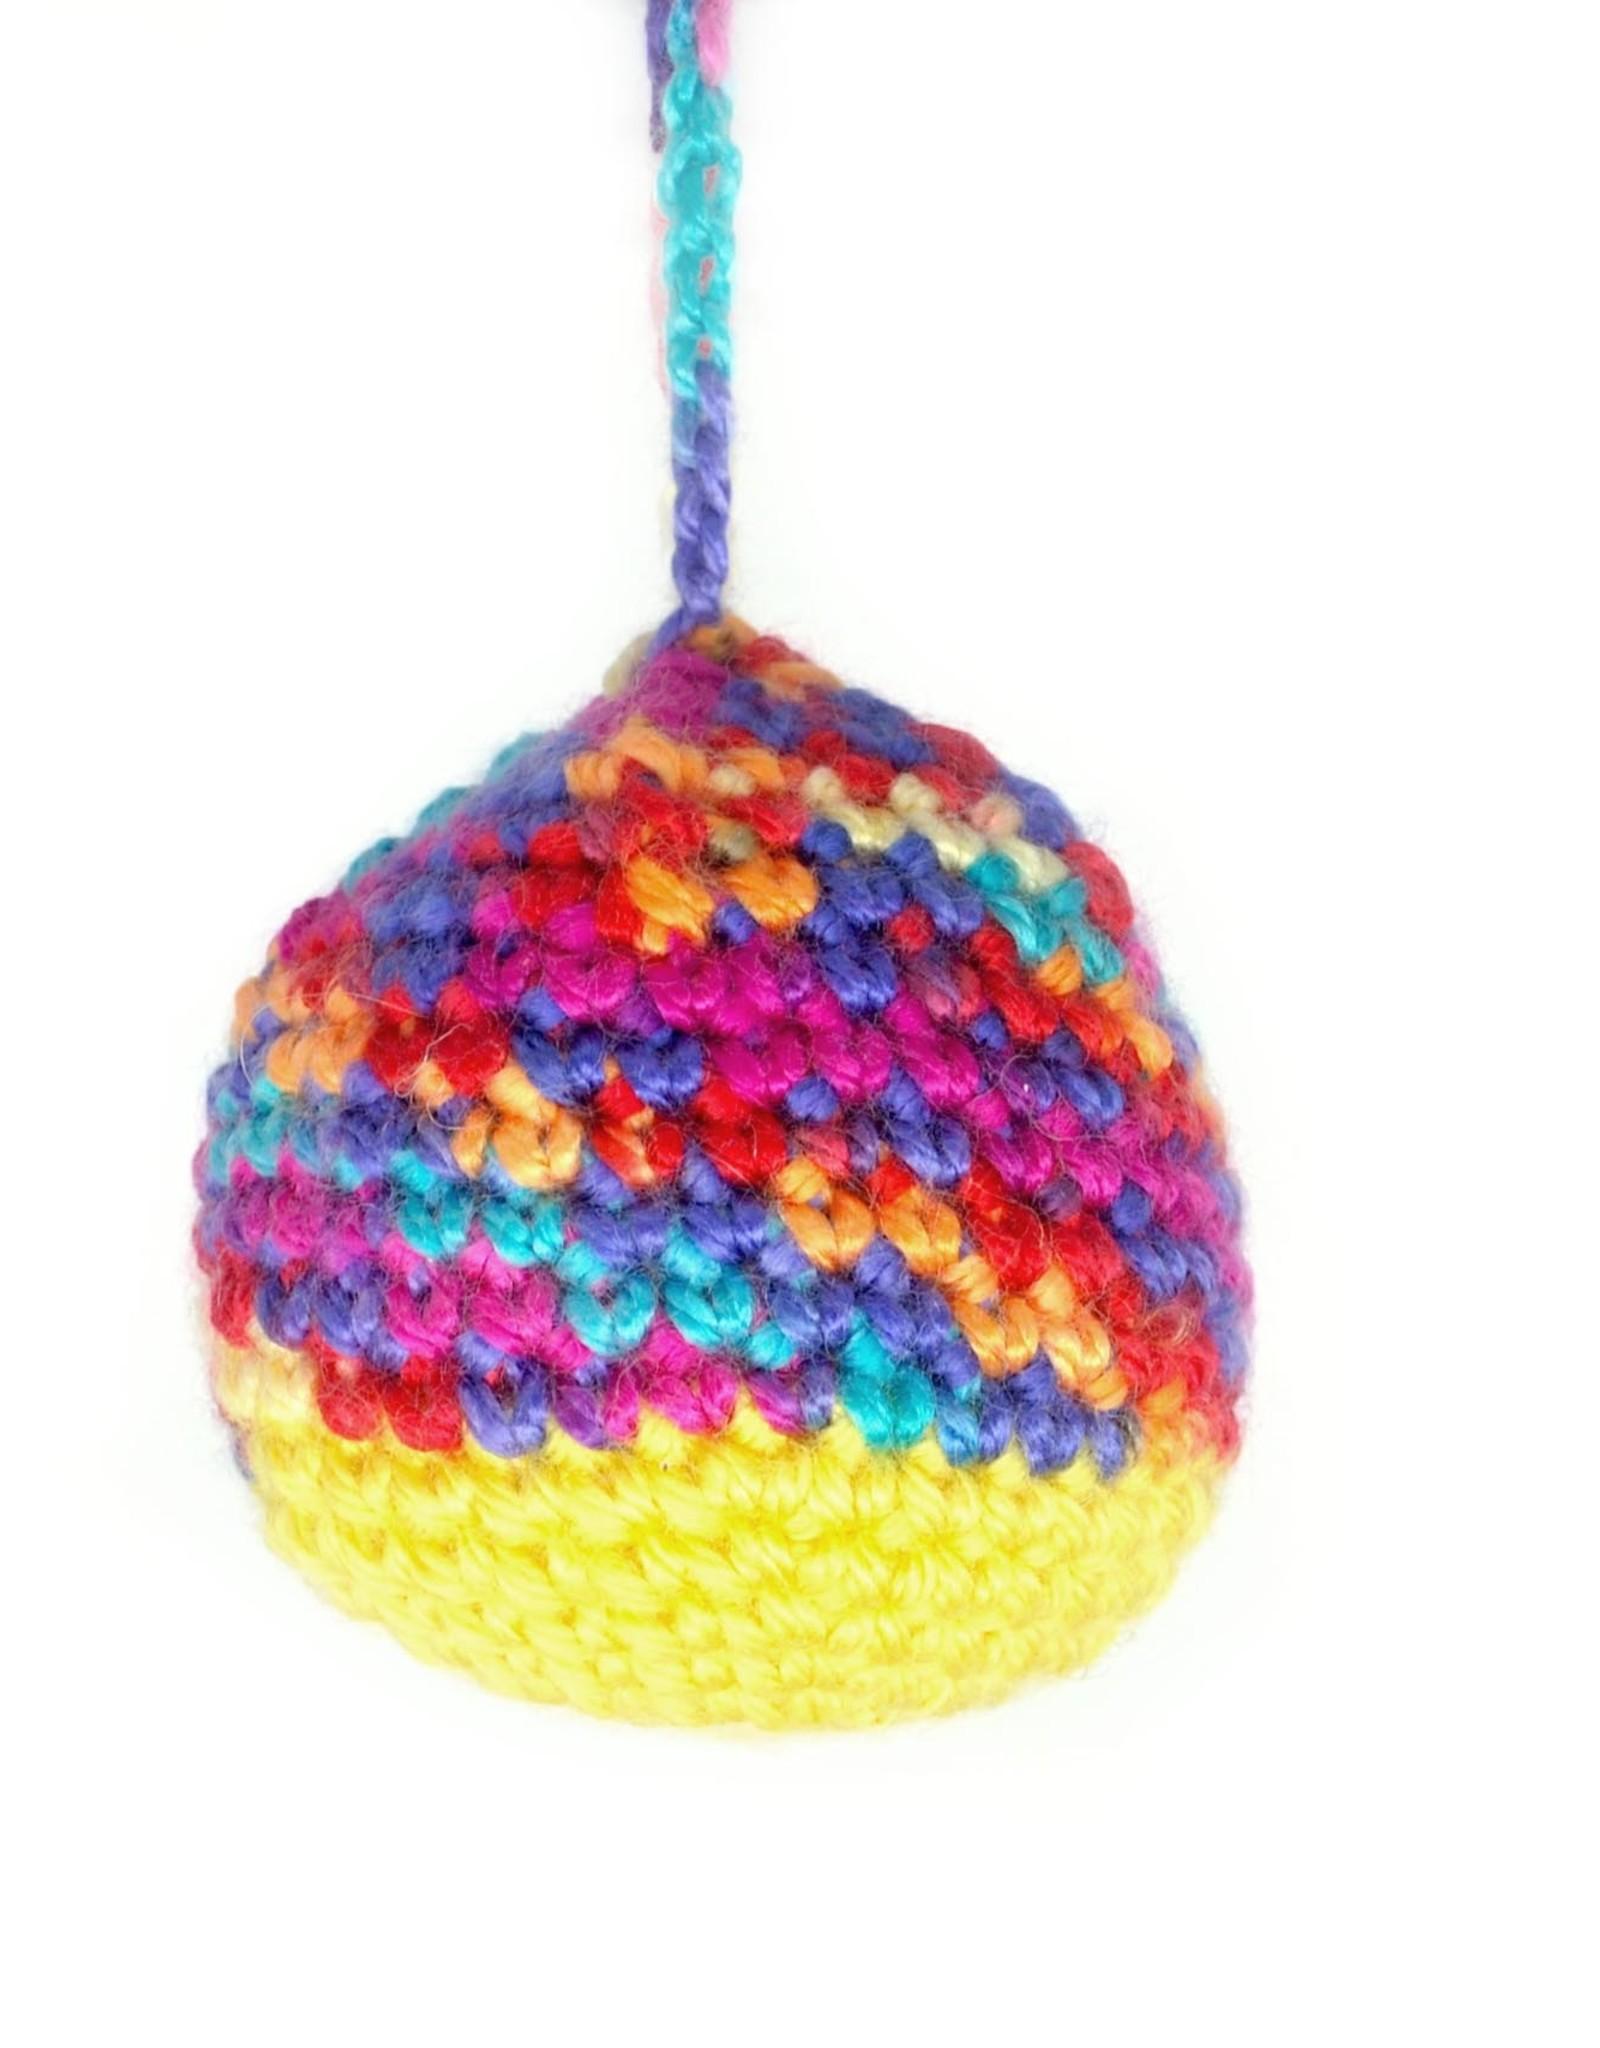 Multicolor Crochet Ornament by Hale Ekinci